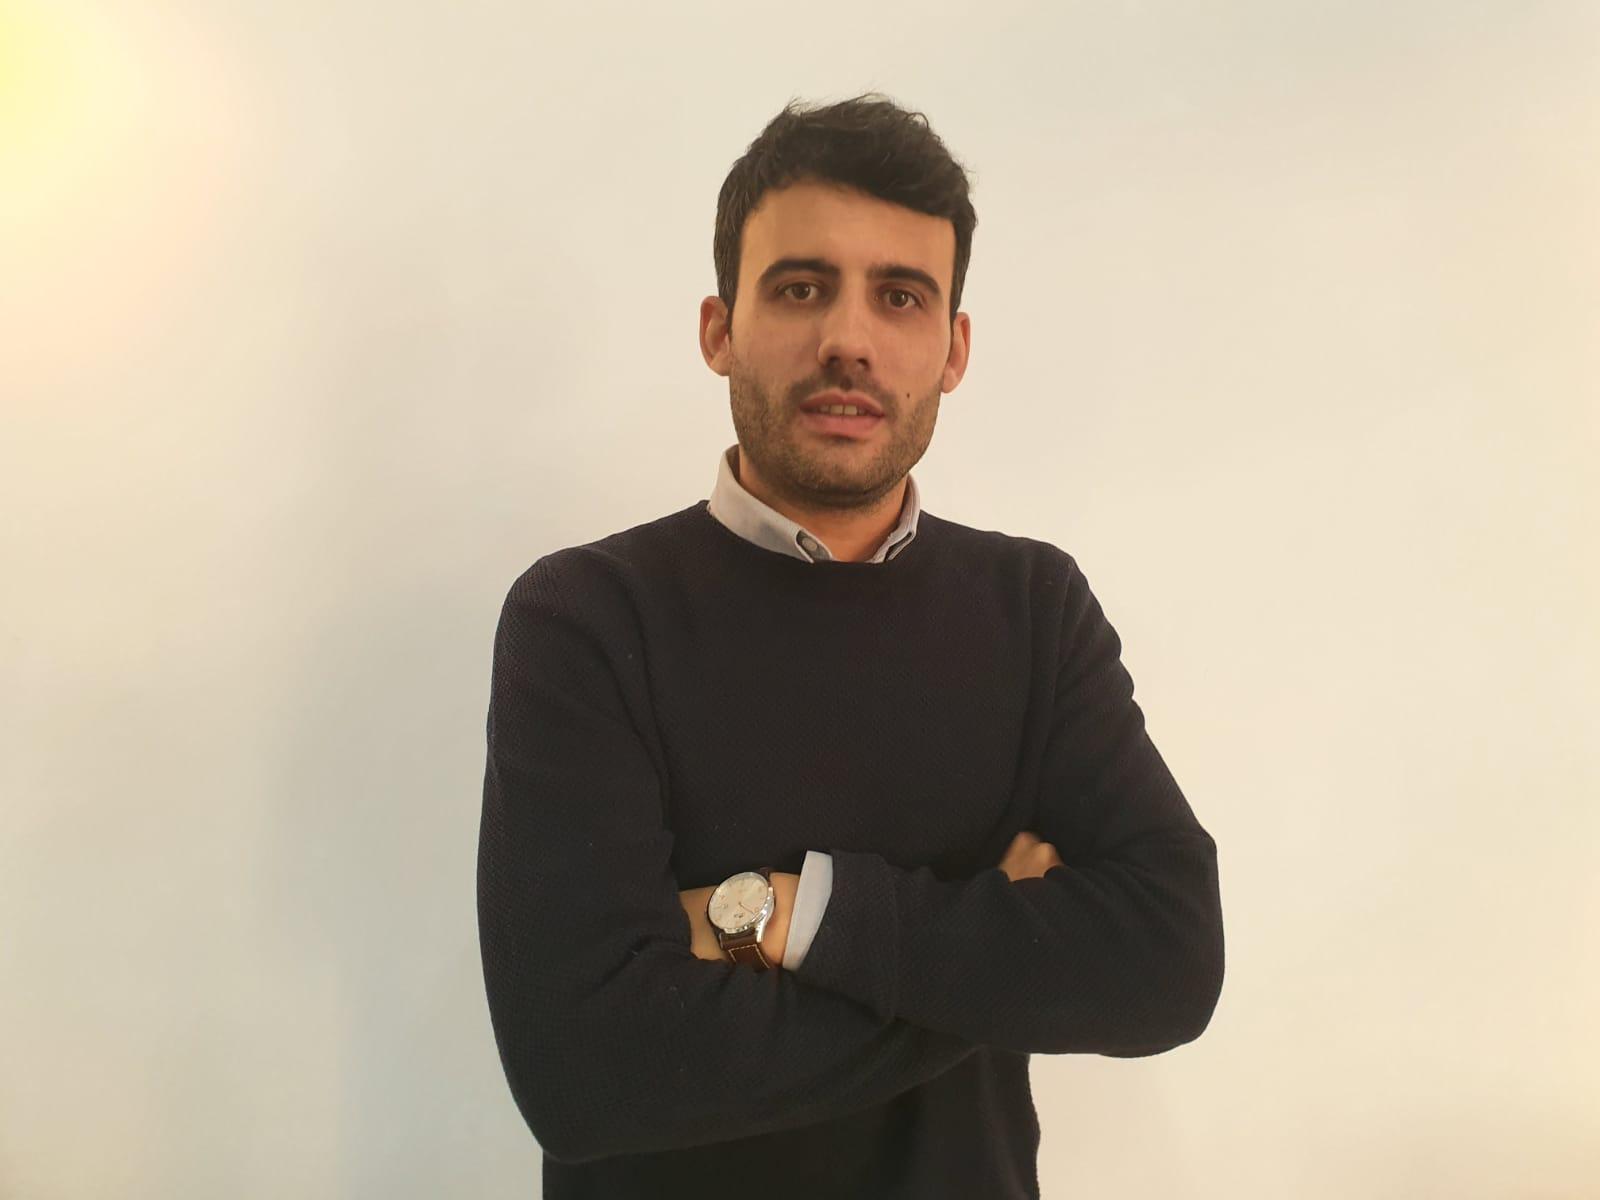 Luis Miguel López